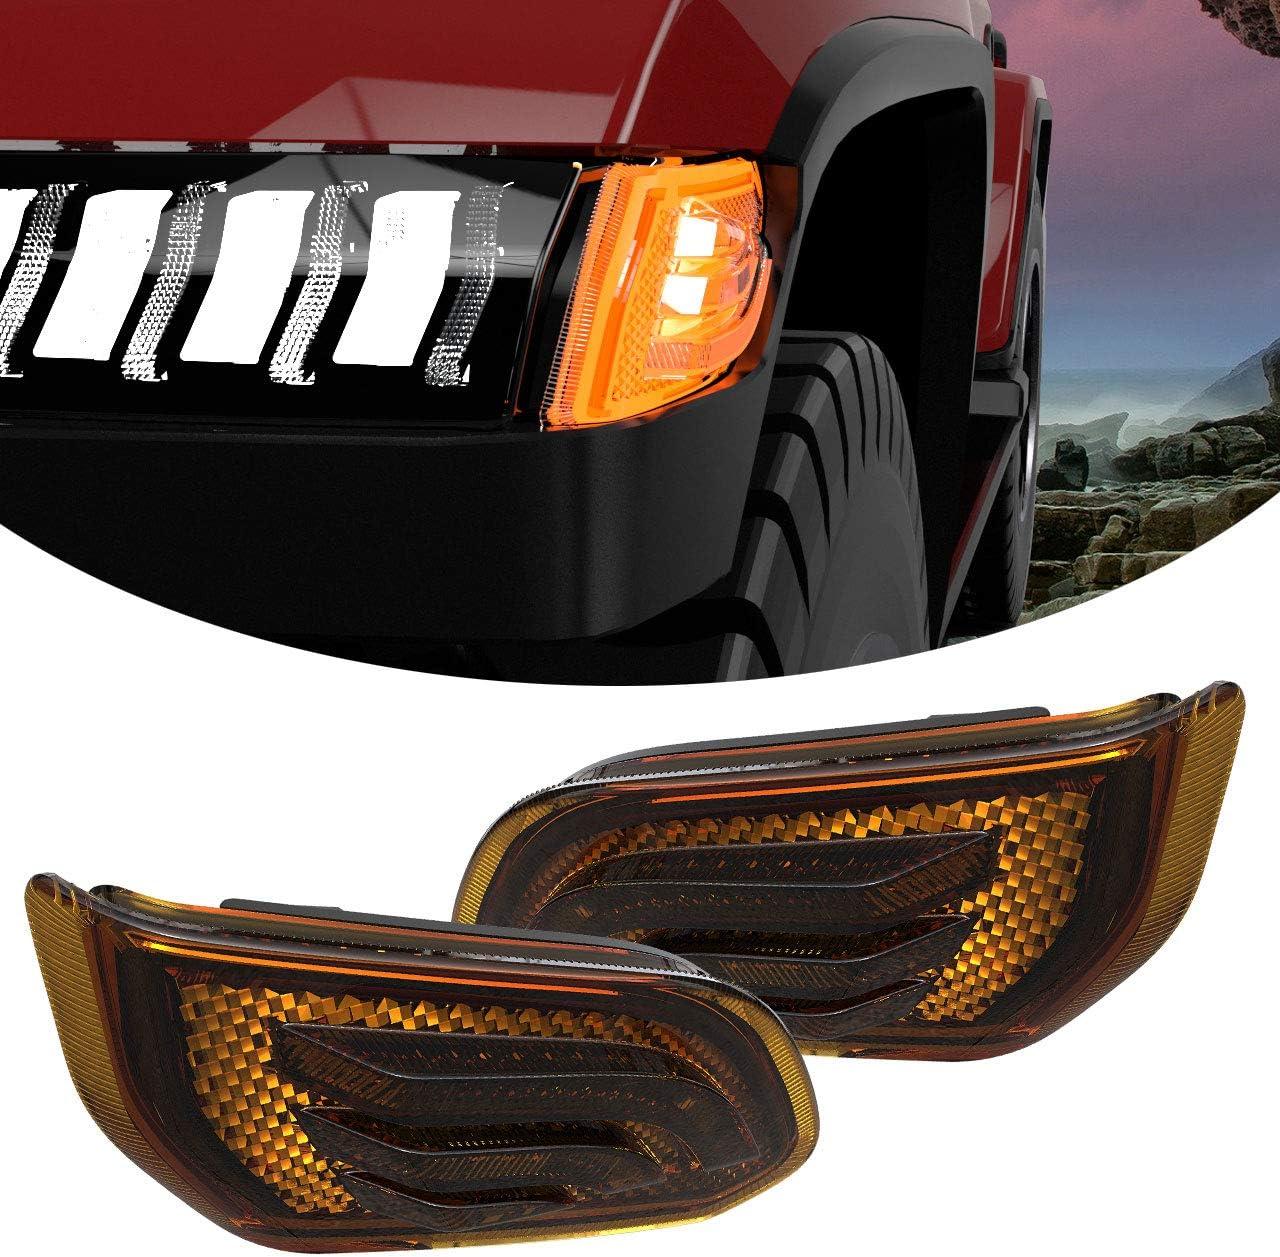 2 Pcs LED Side Marker Lights with 20 Lowest price challenge Soldering Wrangler Jeep Compatible JL